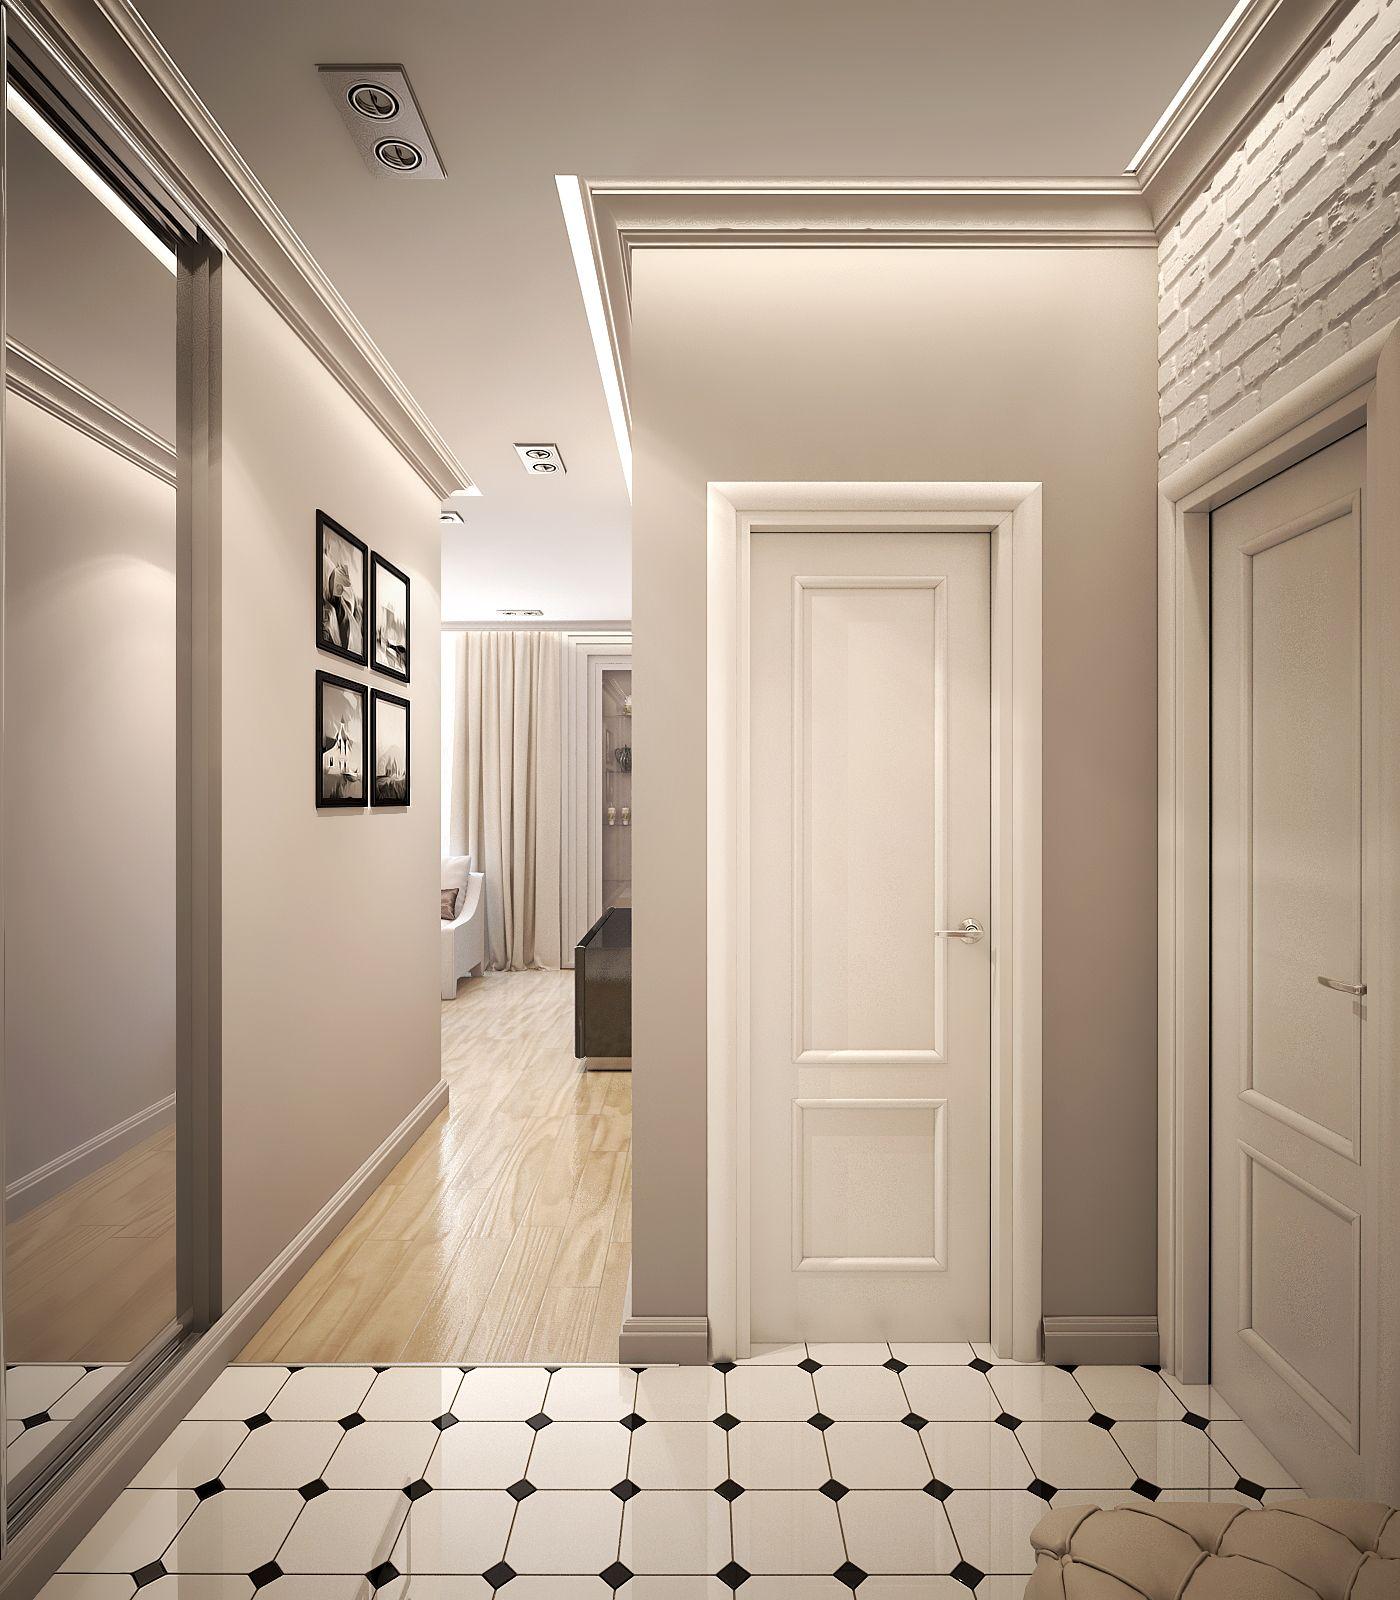 Pin By Noda On Sovremennaya Klassika Contemporary Living Room Design Home Room Design Living Room Designs